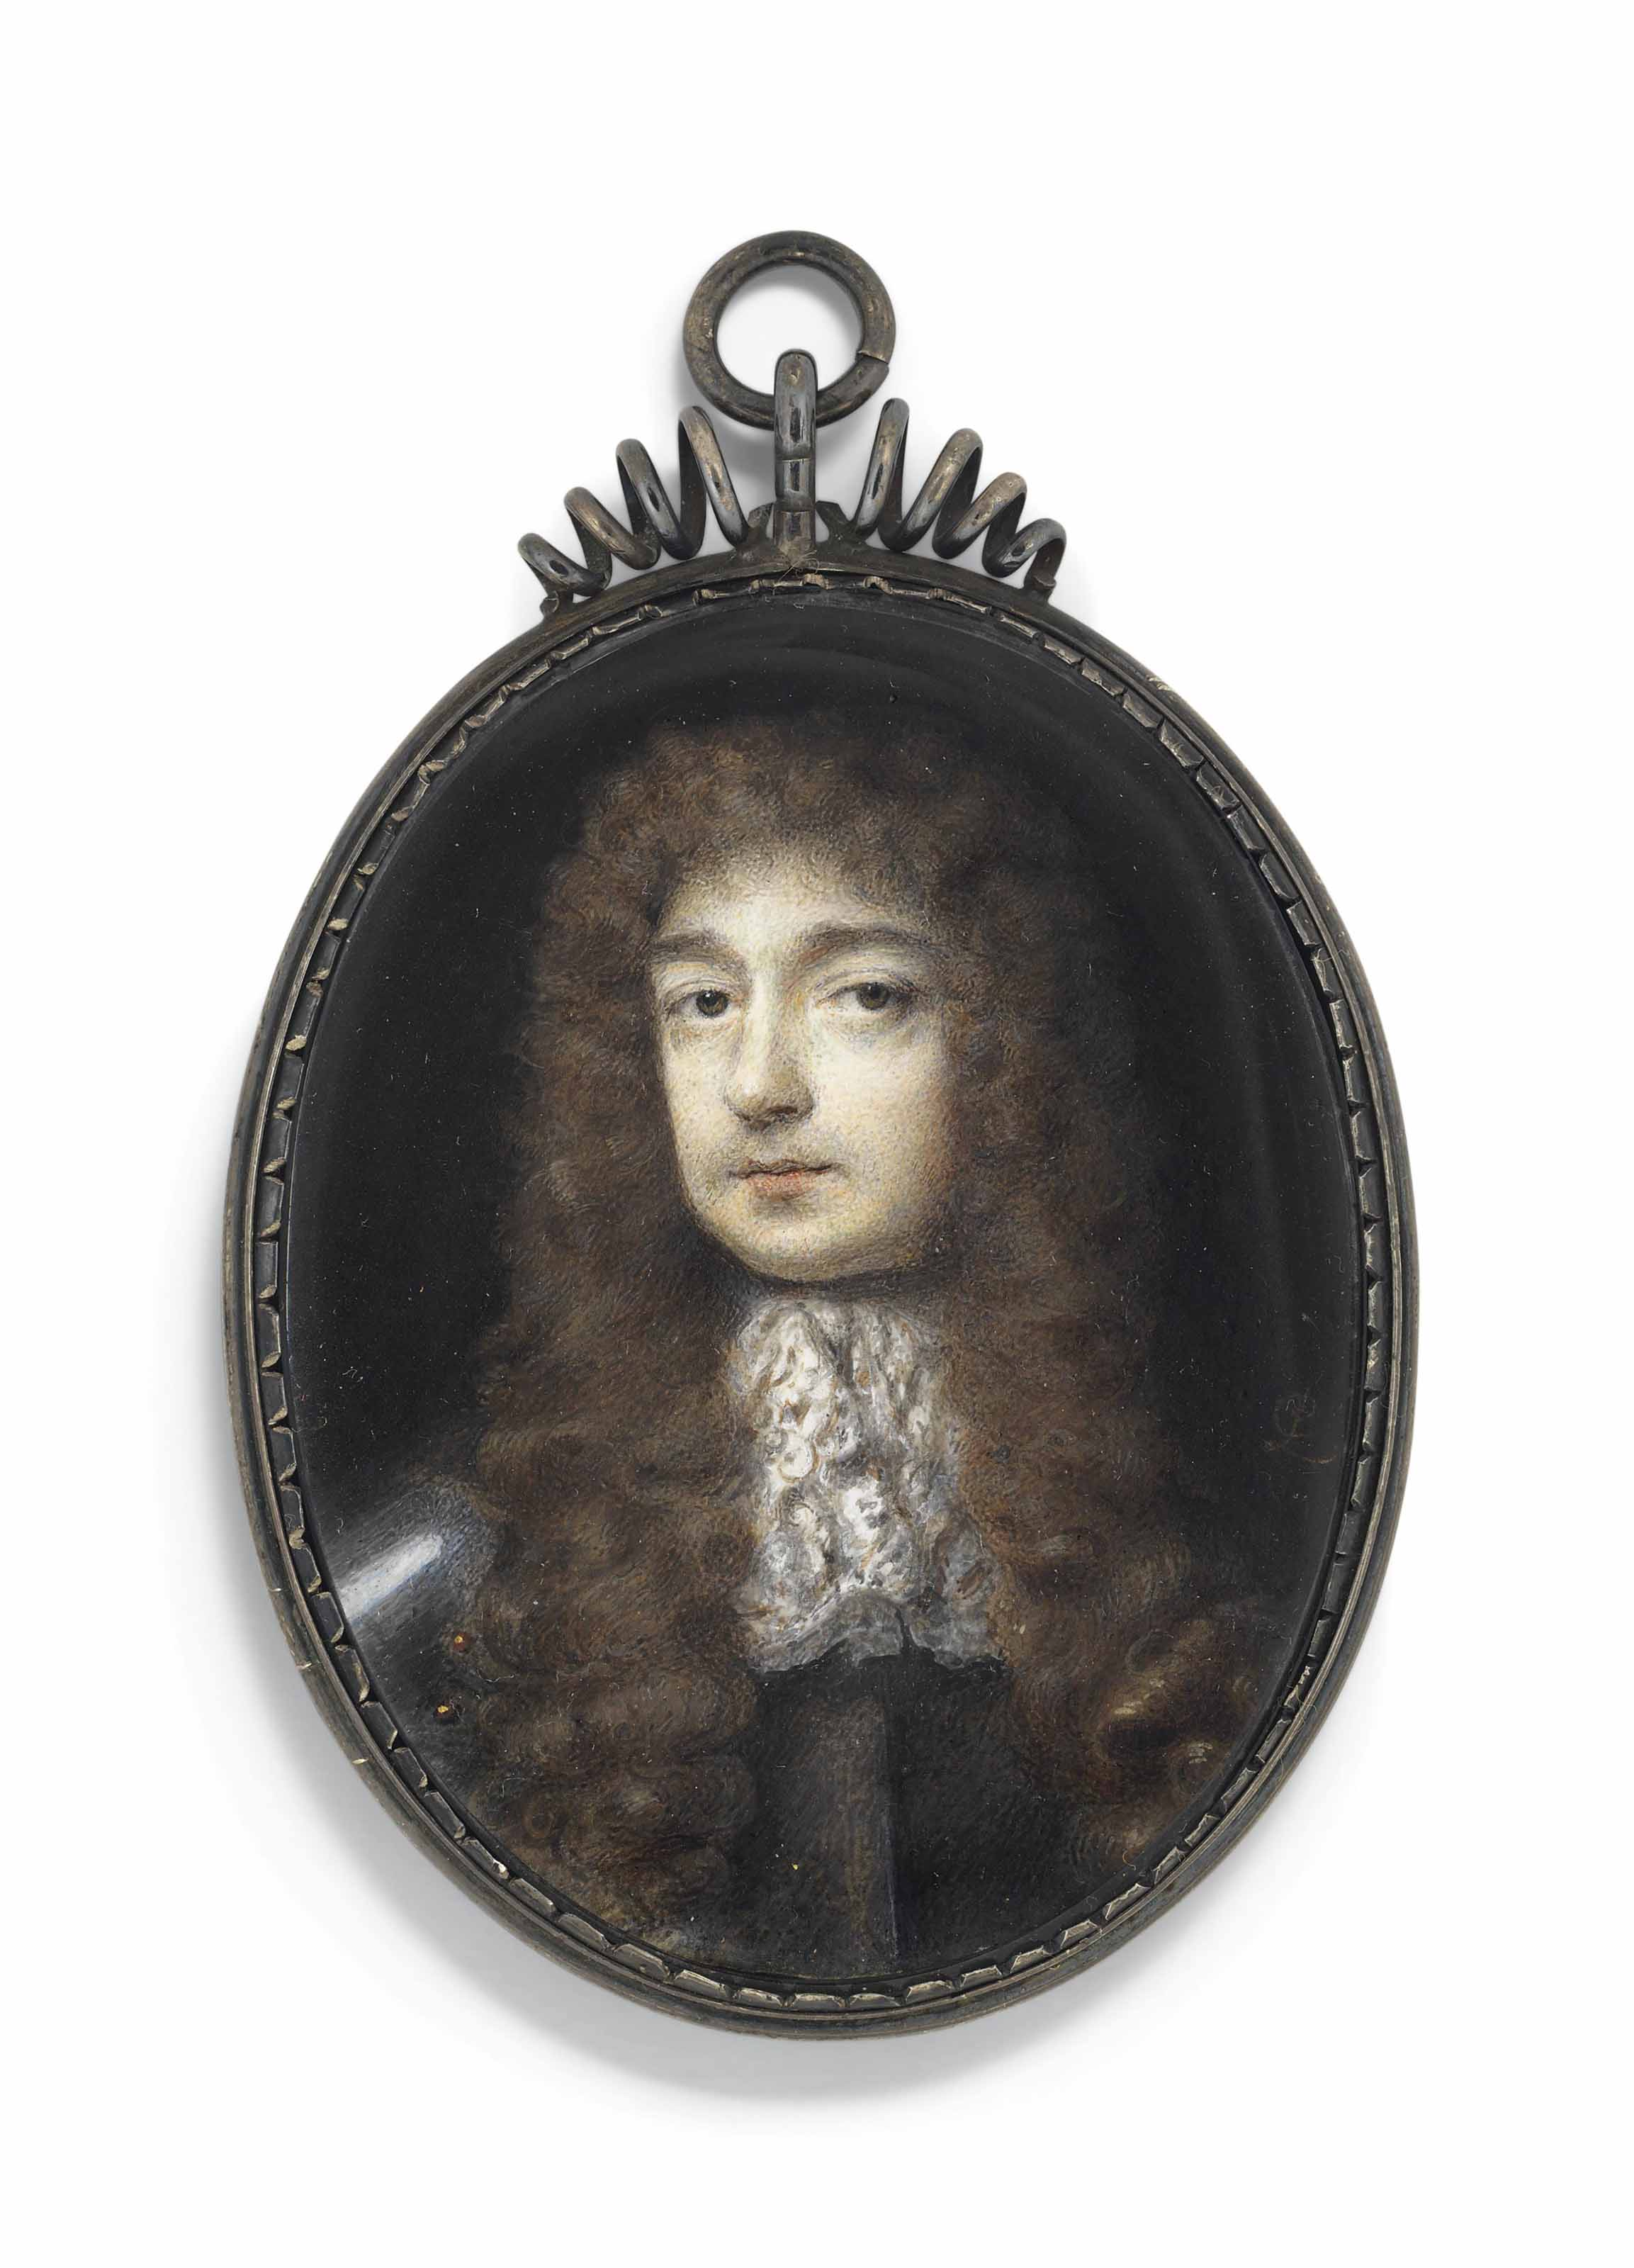 PETER CROSS (BRITISH, C. 1645-1724)